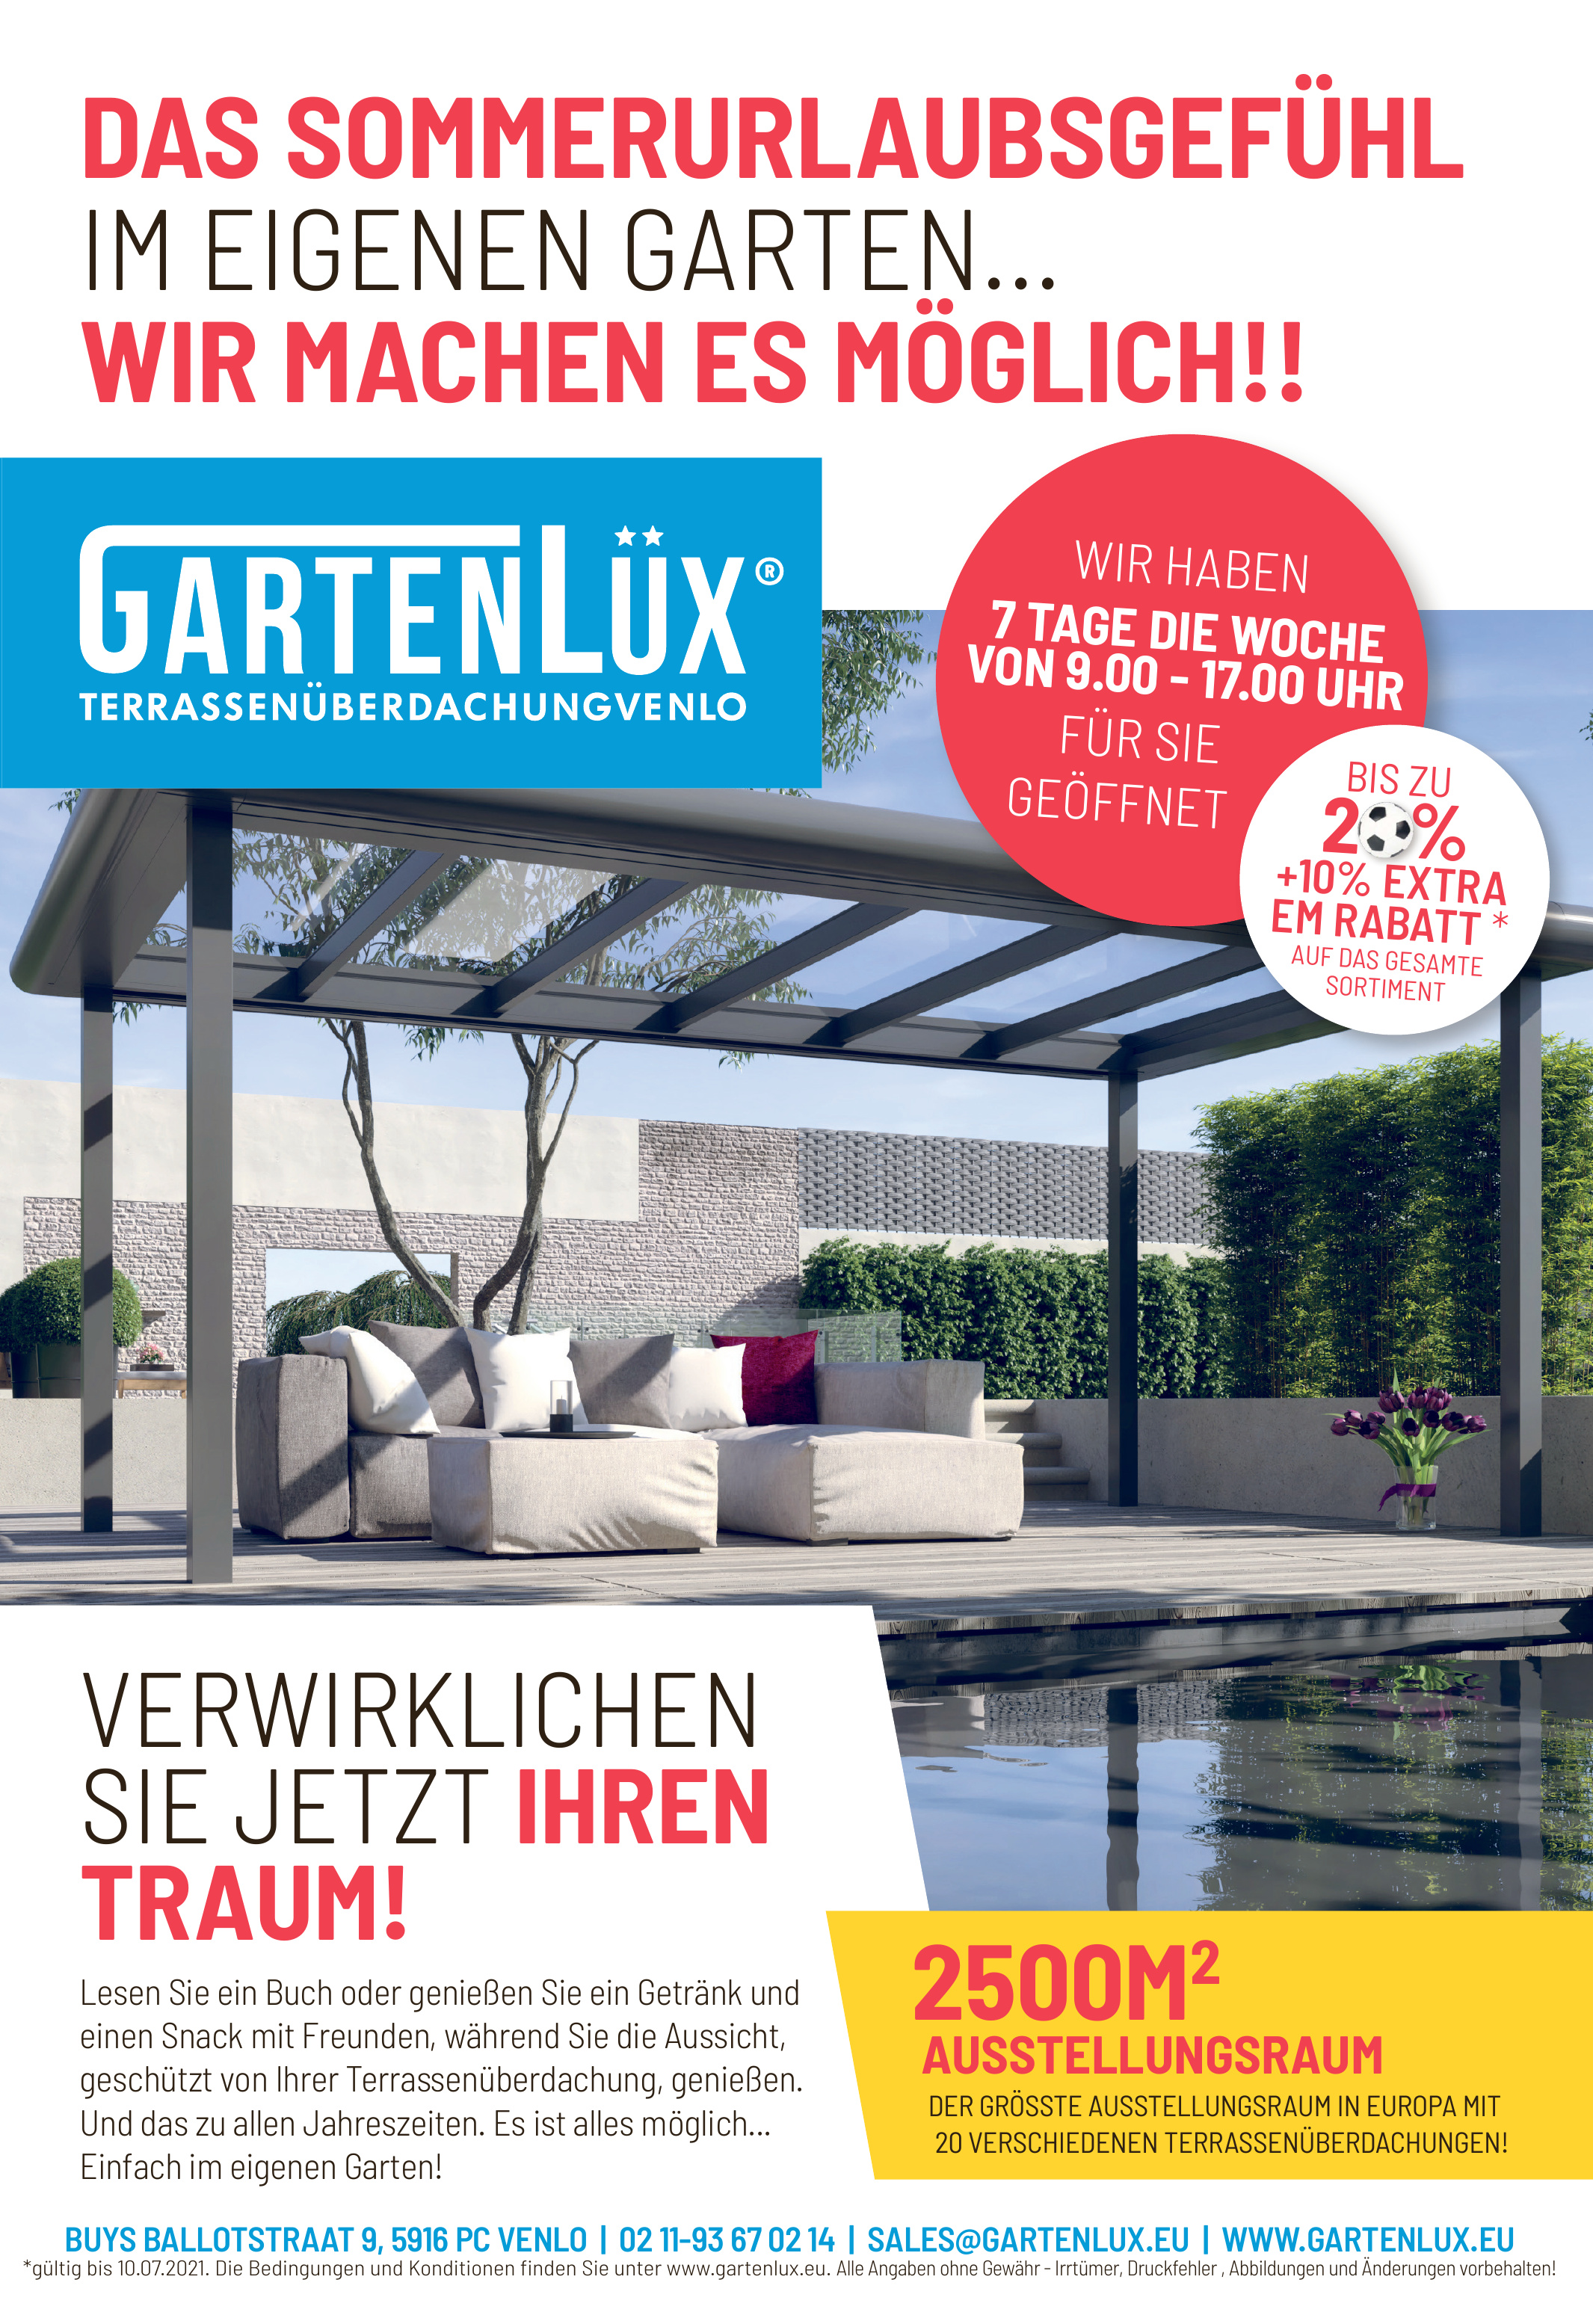 GartenLüx - Terrassenüberdachungvenlo